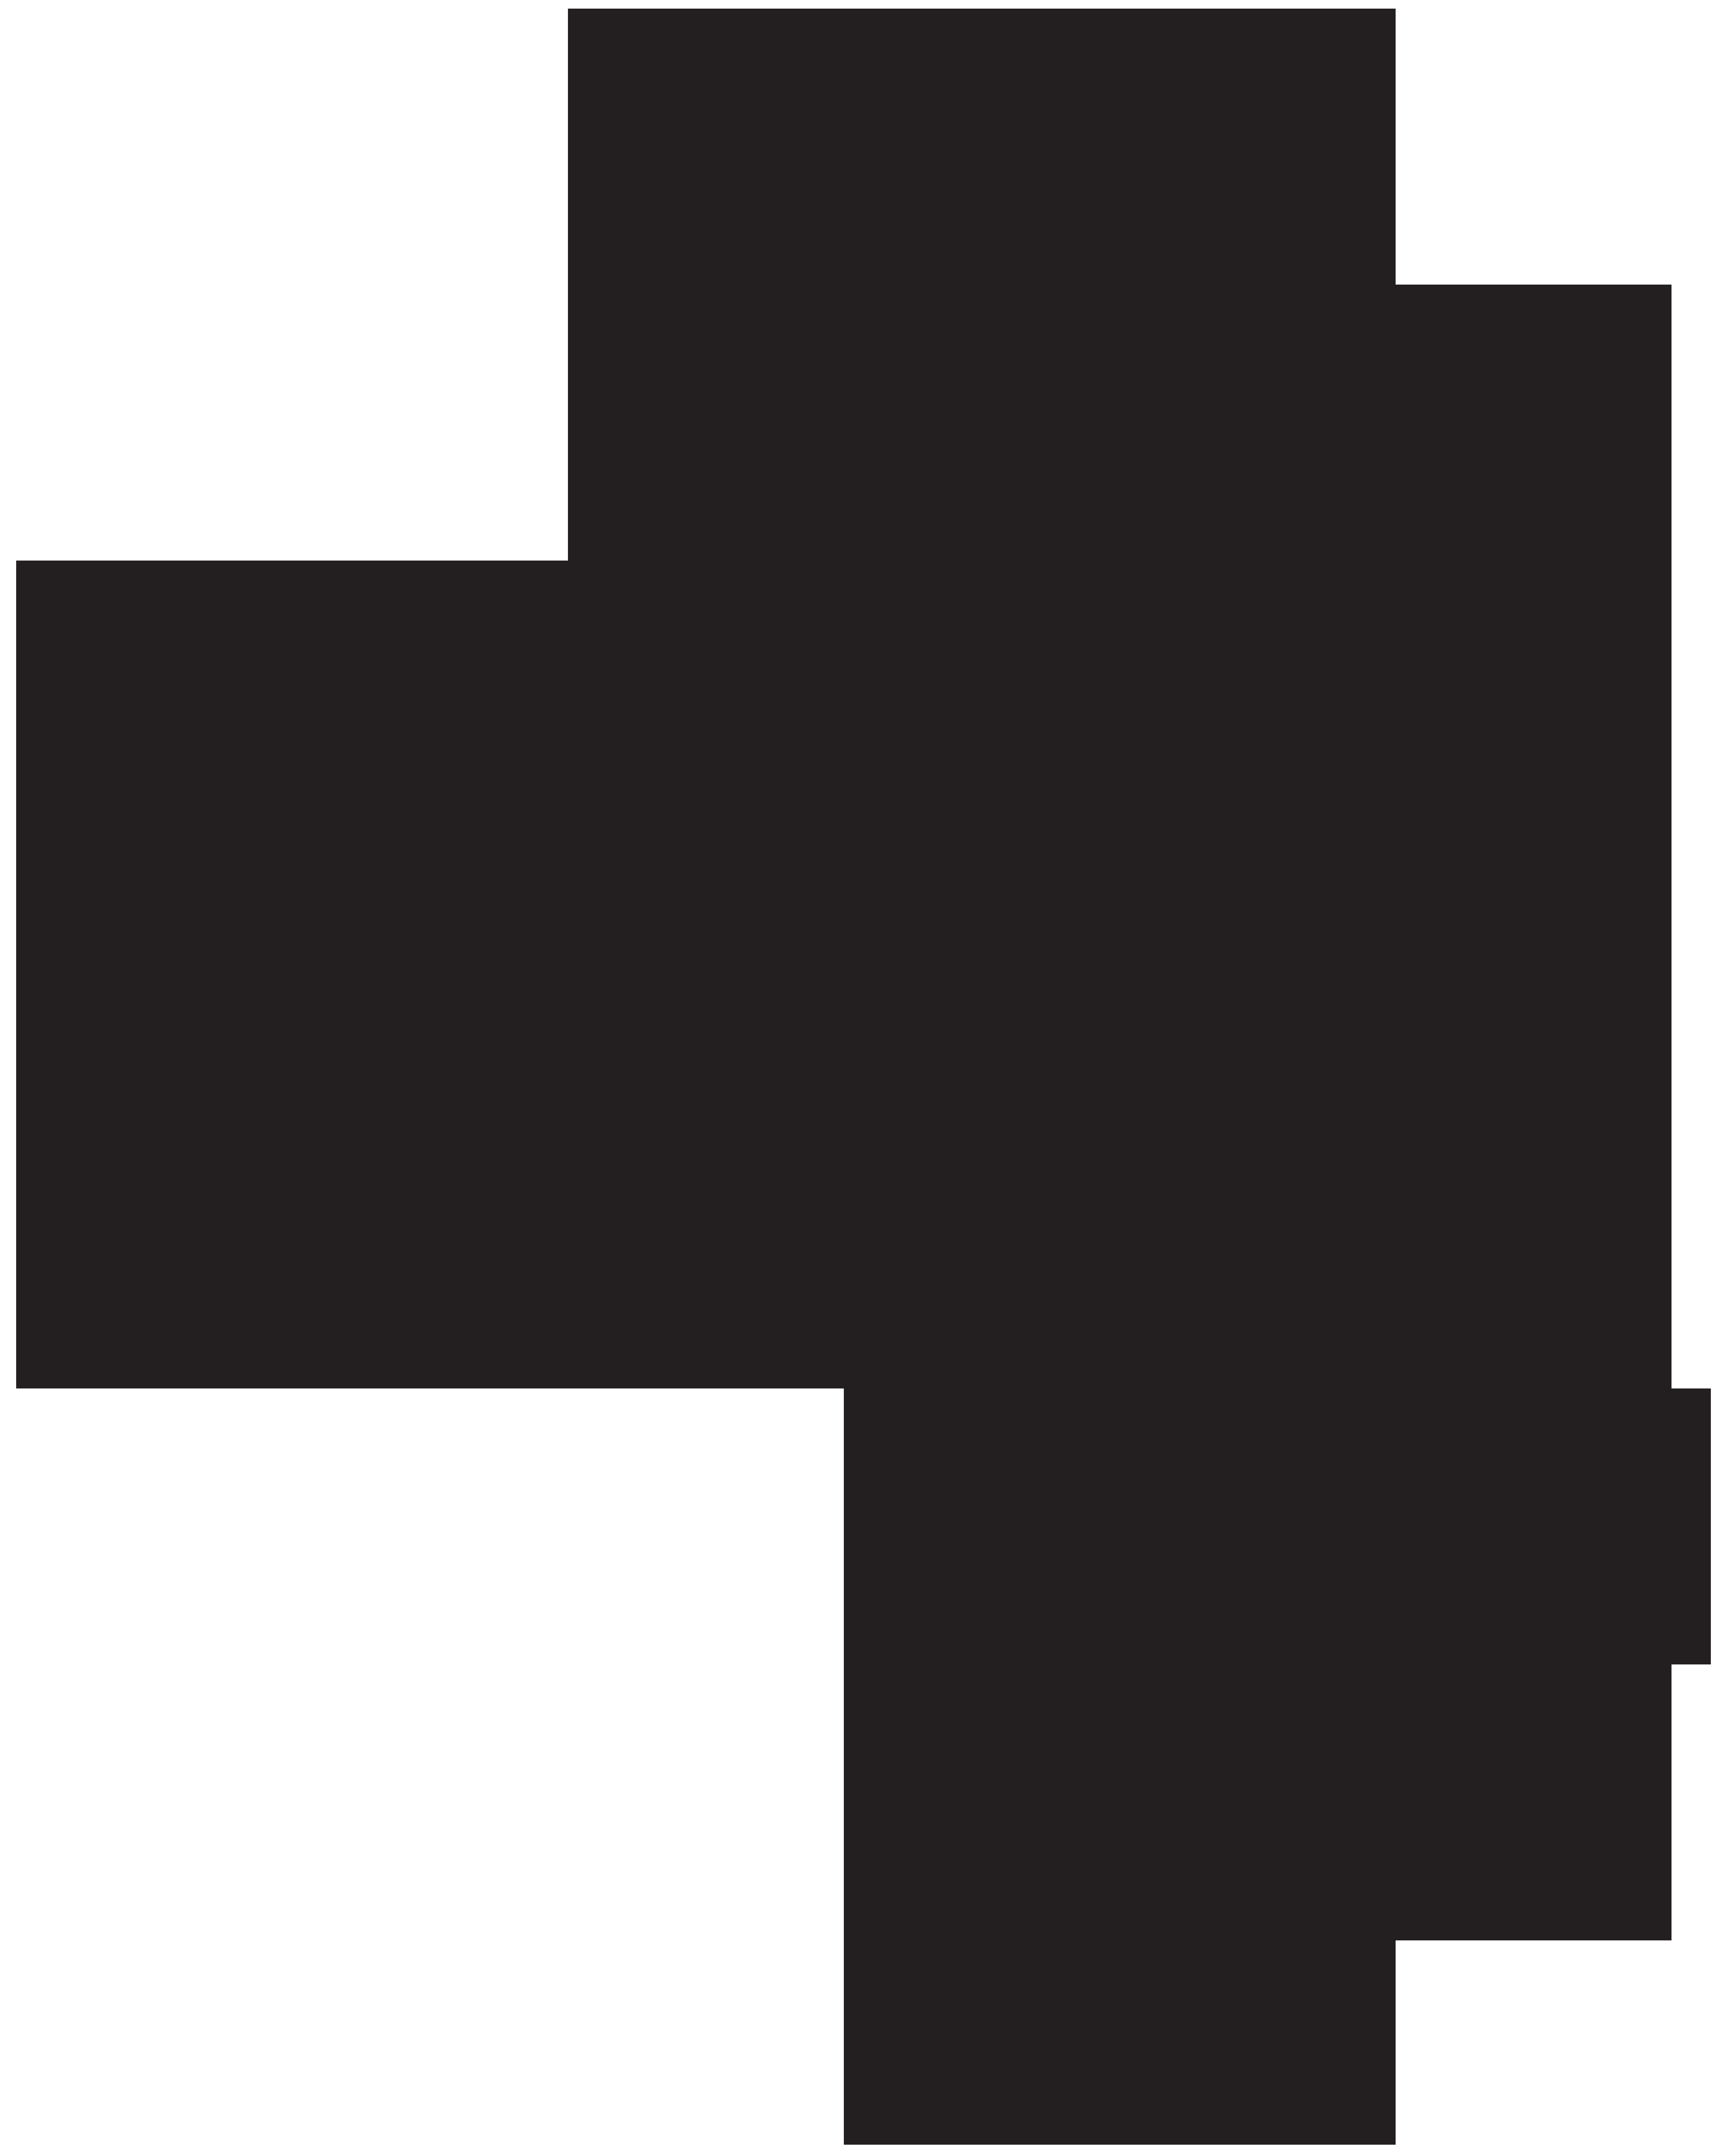 Player silhouette clip art. Clipart person tennis